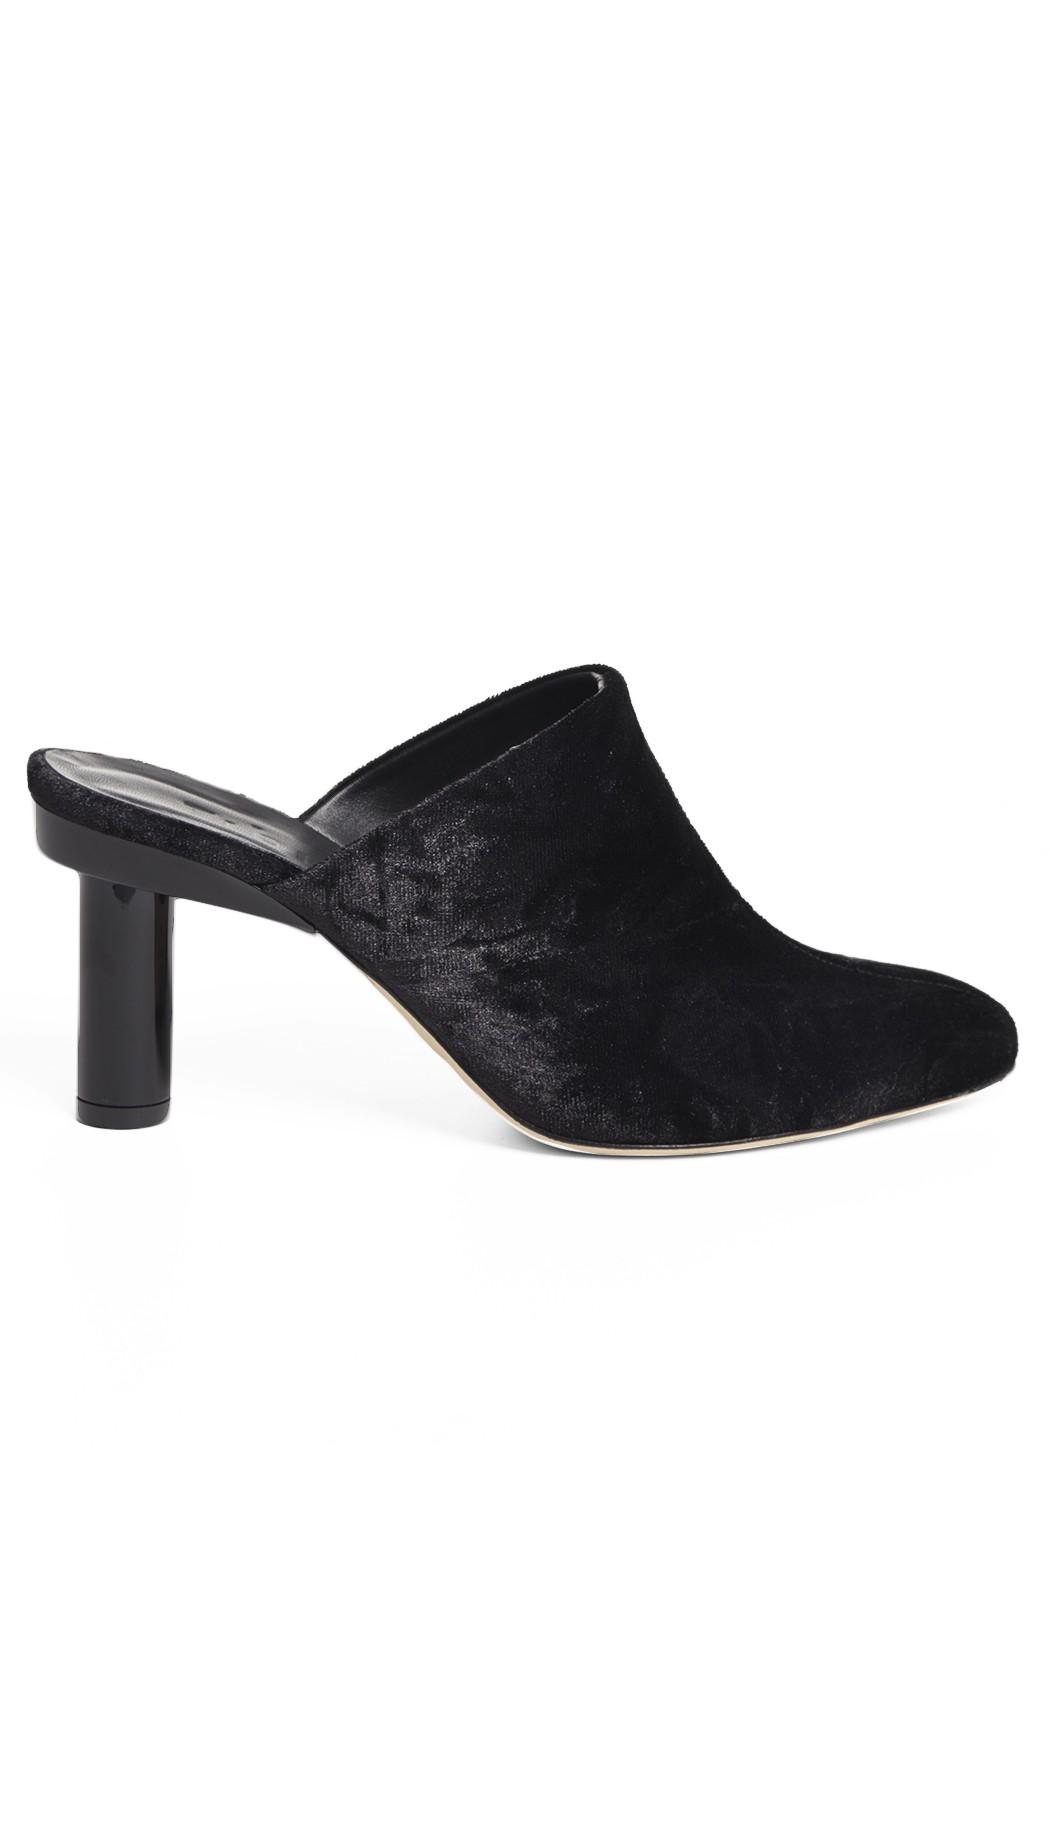 Tibi Black Zoe Heels